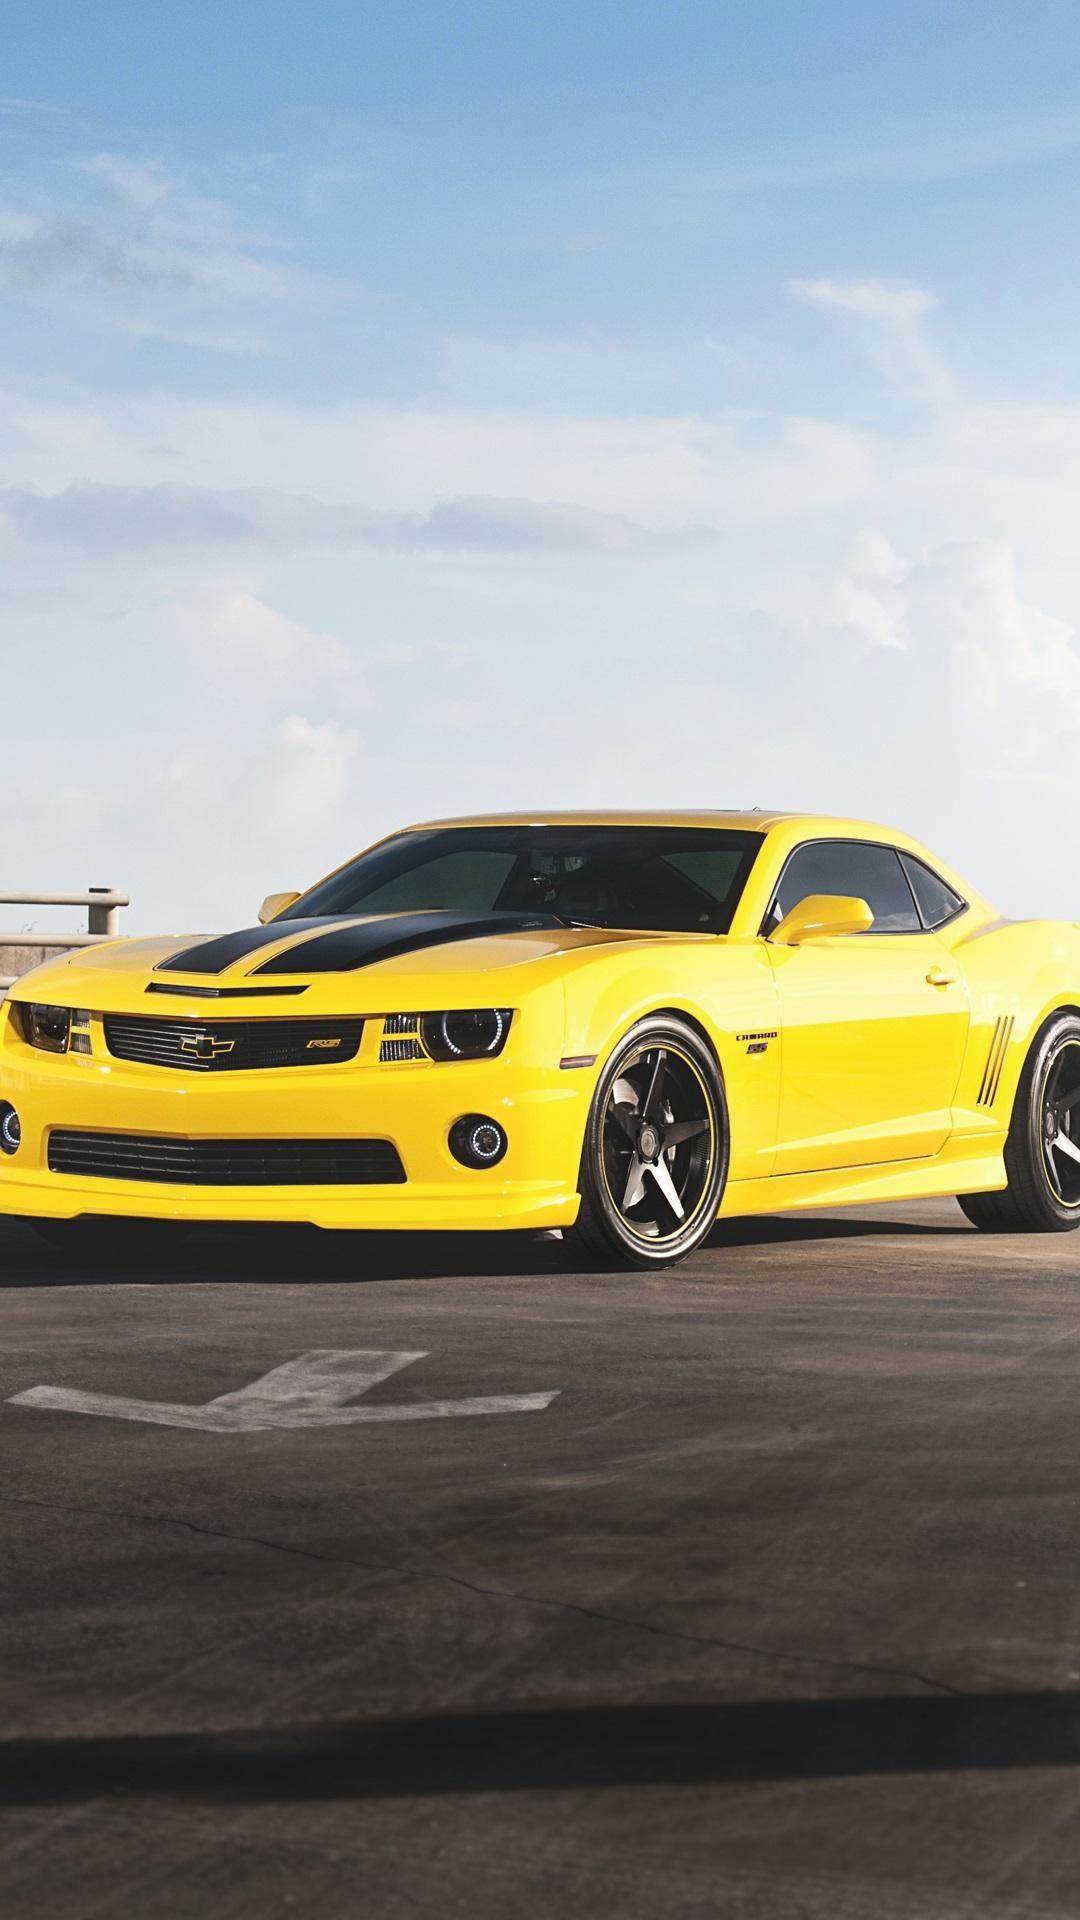 Yellow Car Android Wallpaper Hd Wallpapers Free Chevrolet Camaro Camaro Rs Camaro